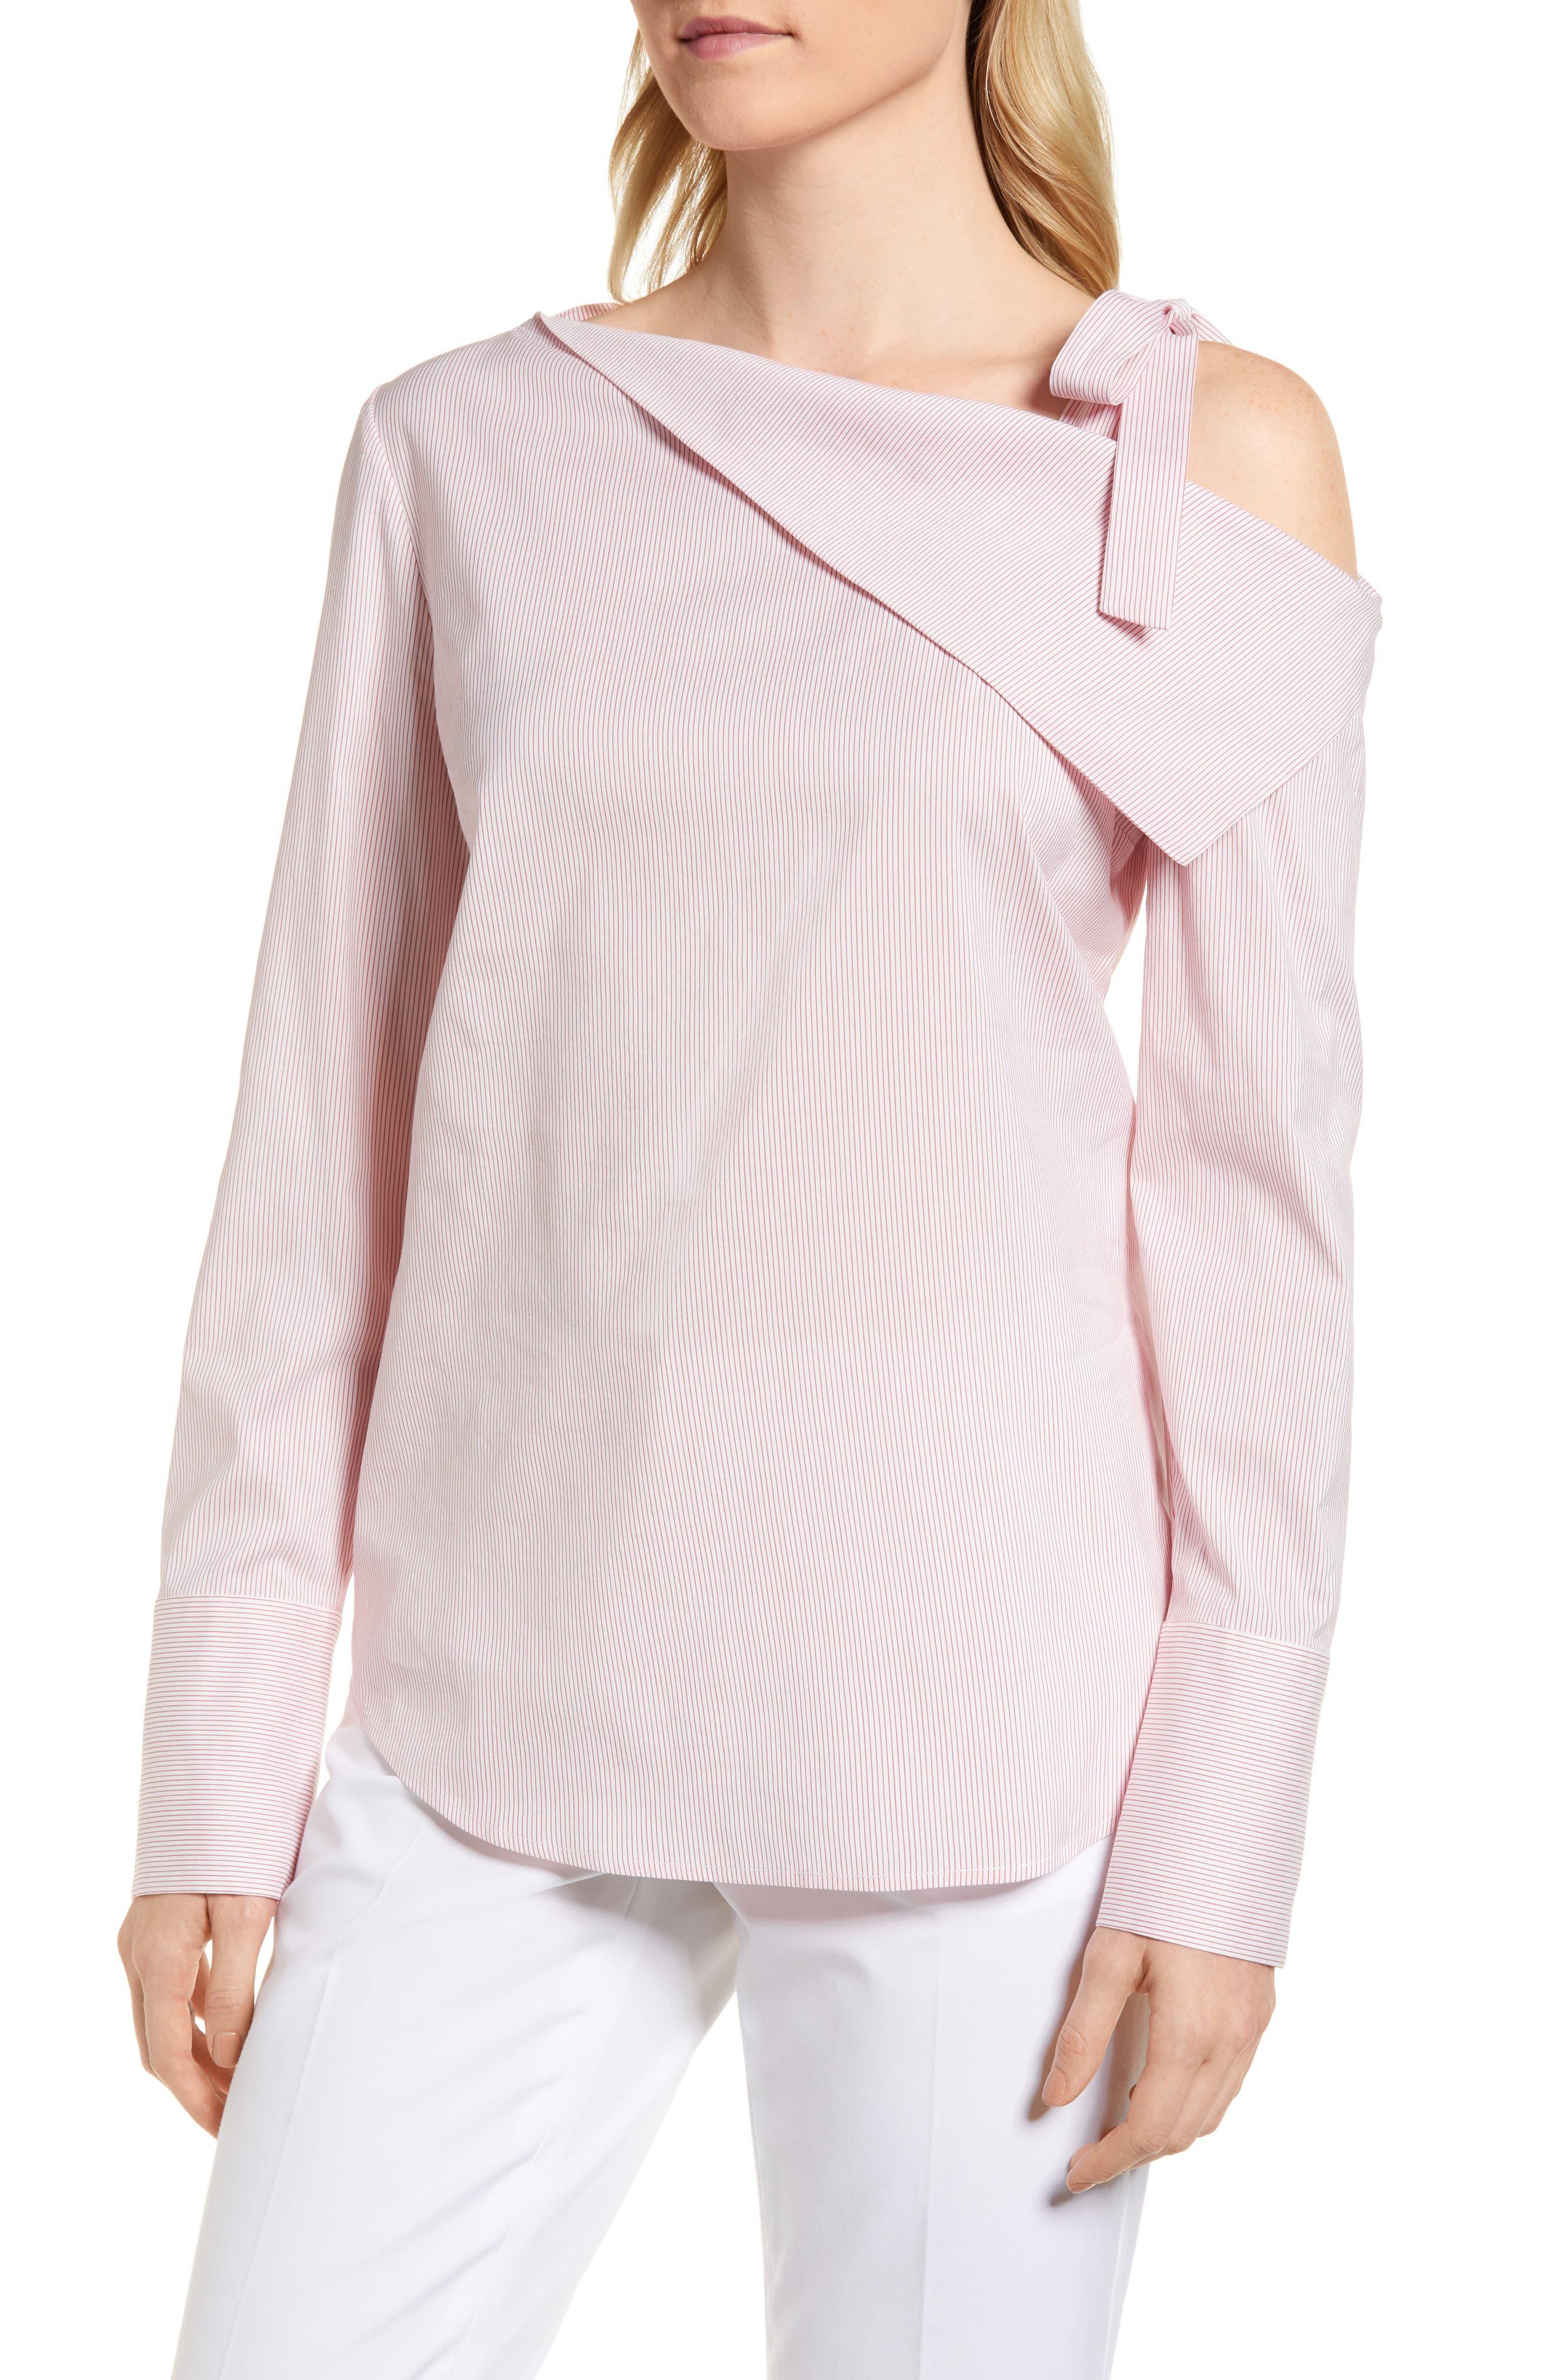 One-Shoulder Shirt,                         Main,                         color, Pink Honey Chic Stripe